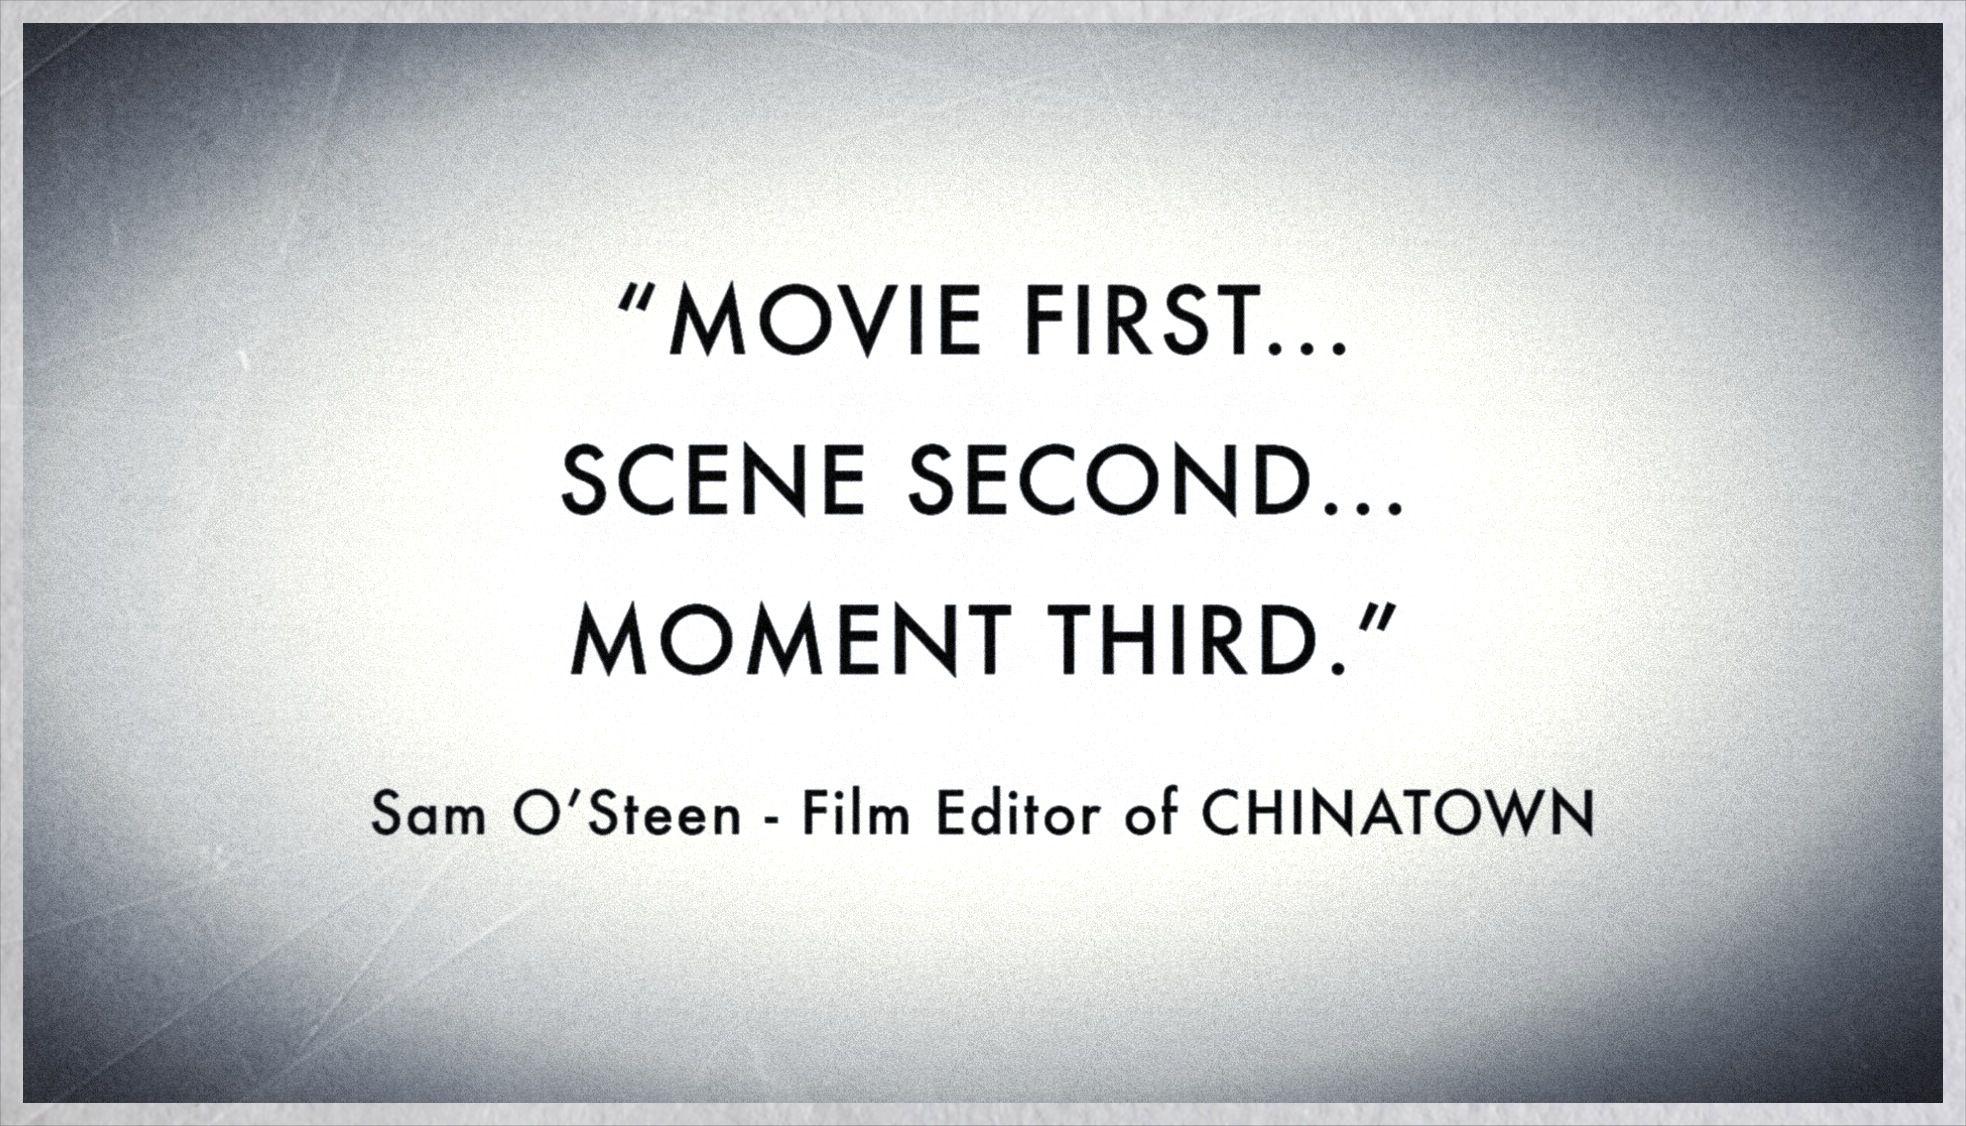 Sam O Steen On Film Editing Vashivisual Blog Filmmaking Quote Dissertation